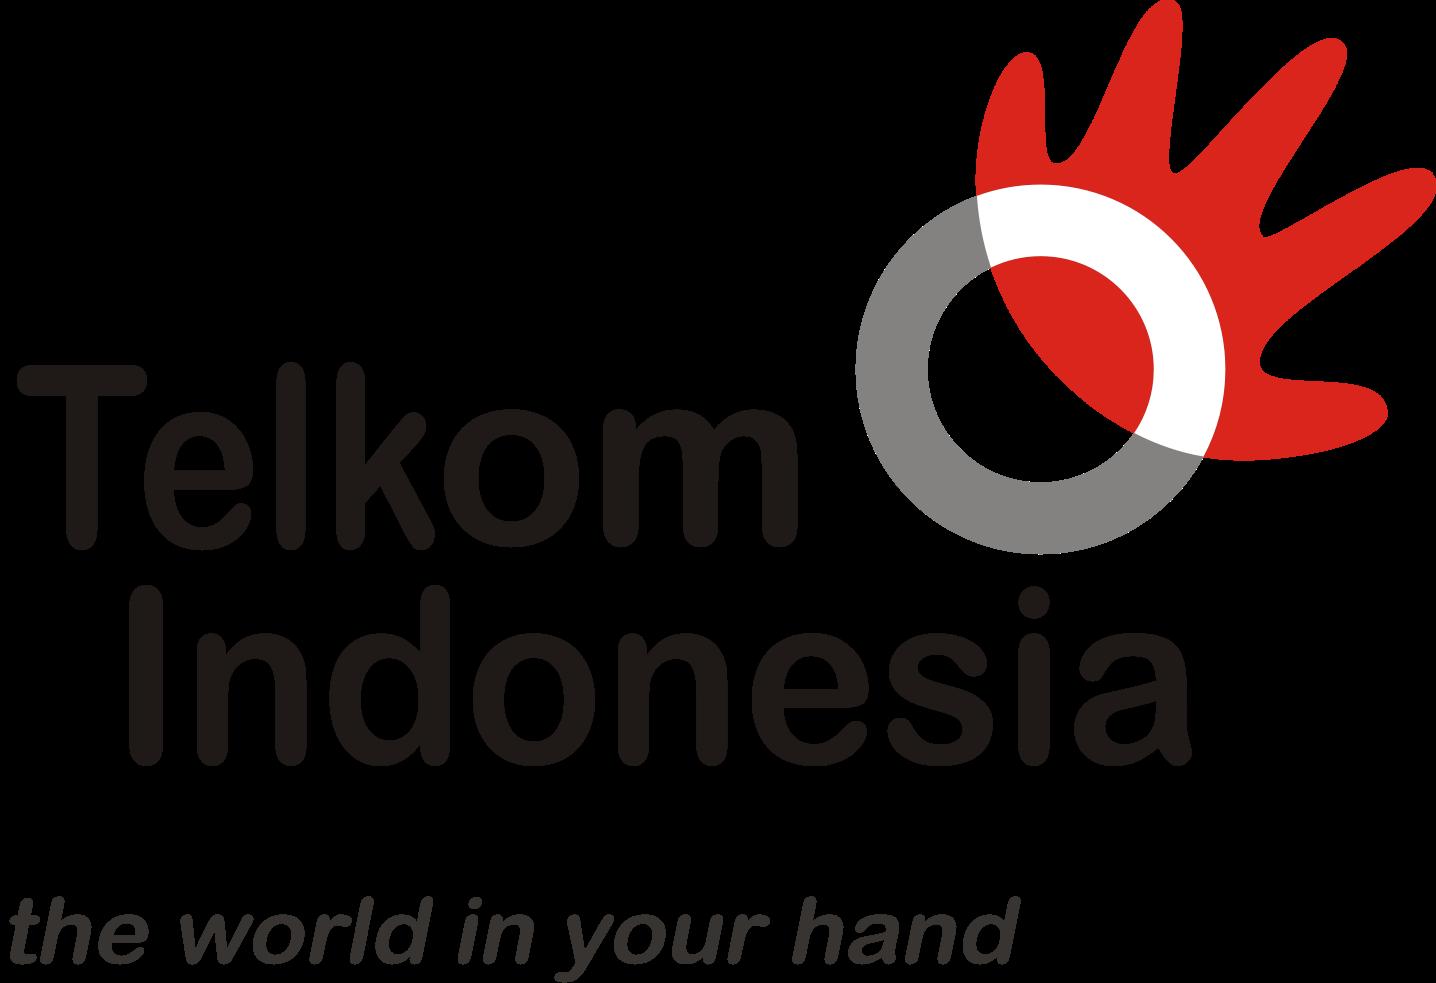 Fifth image of Arti Logo Telkom with Logo Baru PT Telkom 2013 - Ardi La Madi's Blog